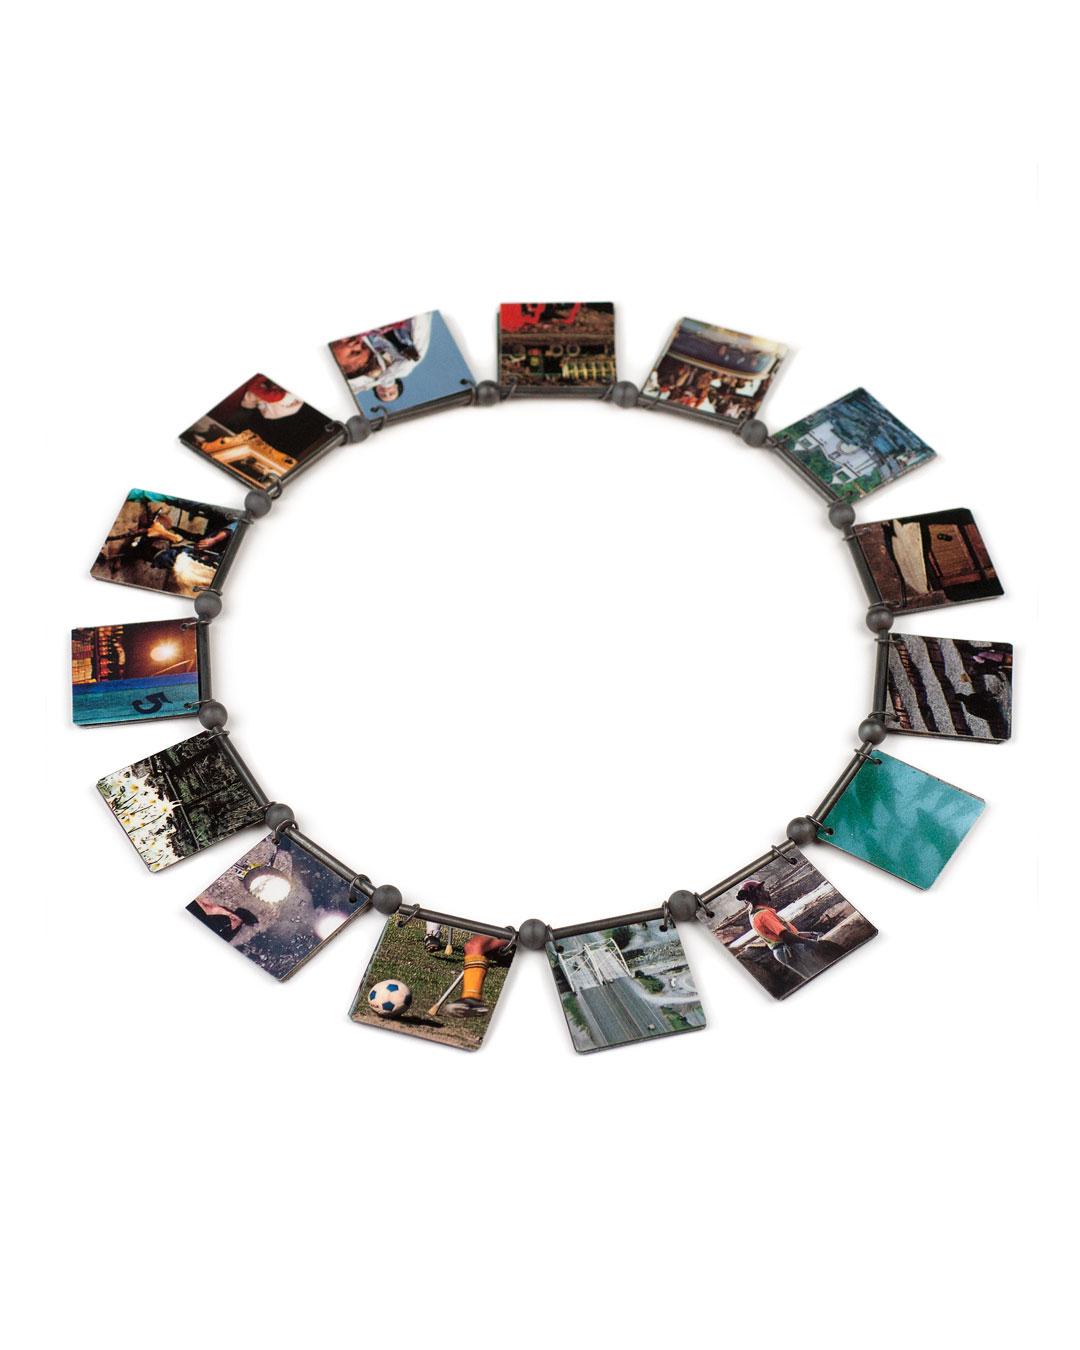 Herman Hermsen, untitled, 1997/2012, necklace; laminated photos, hematite, silver, 315 x 215 x 8 mm, €1250